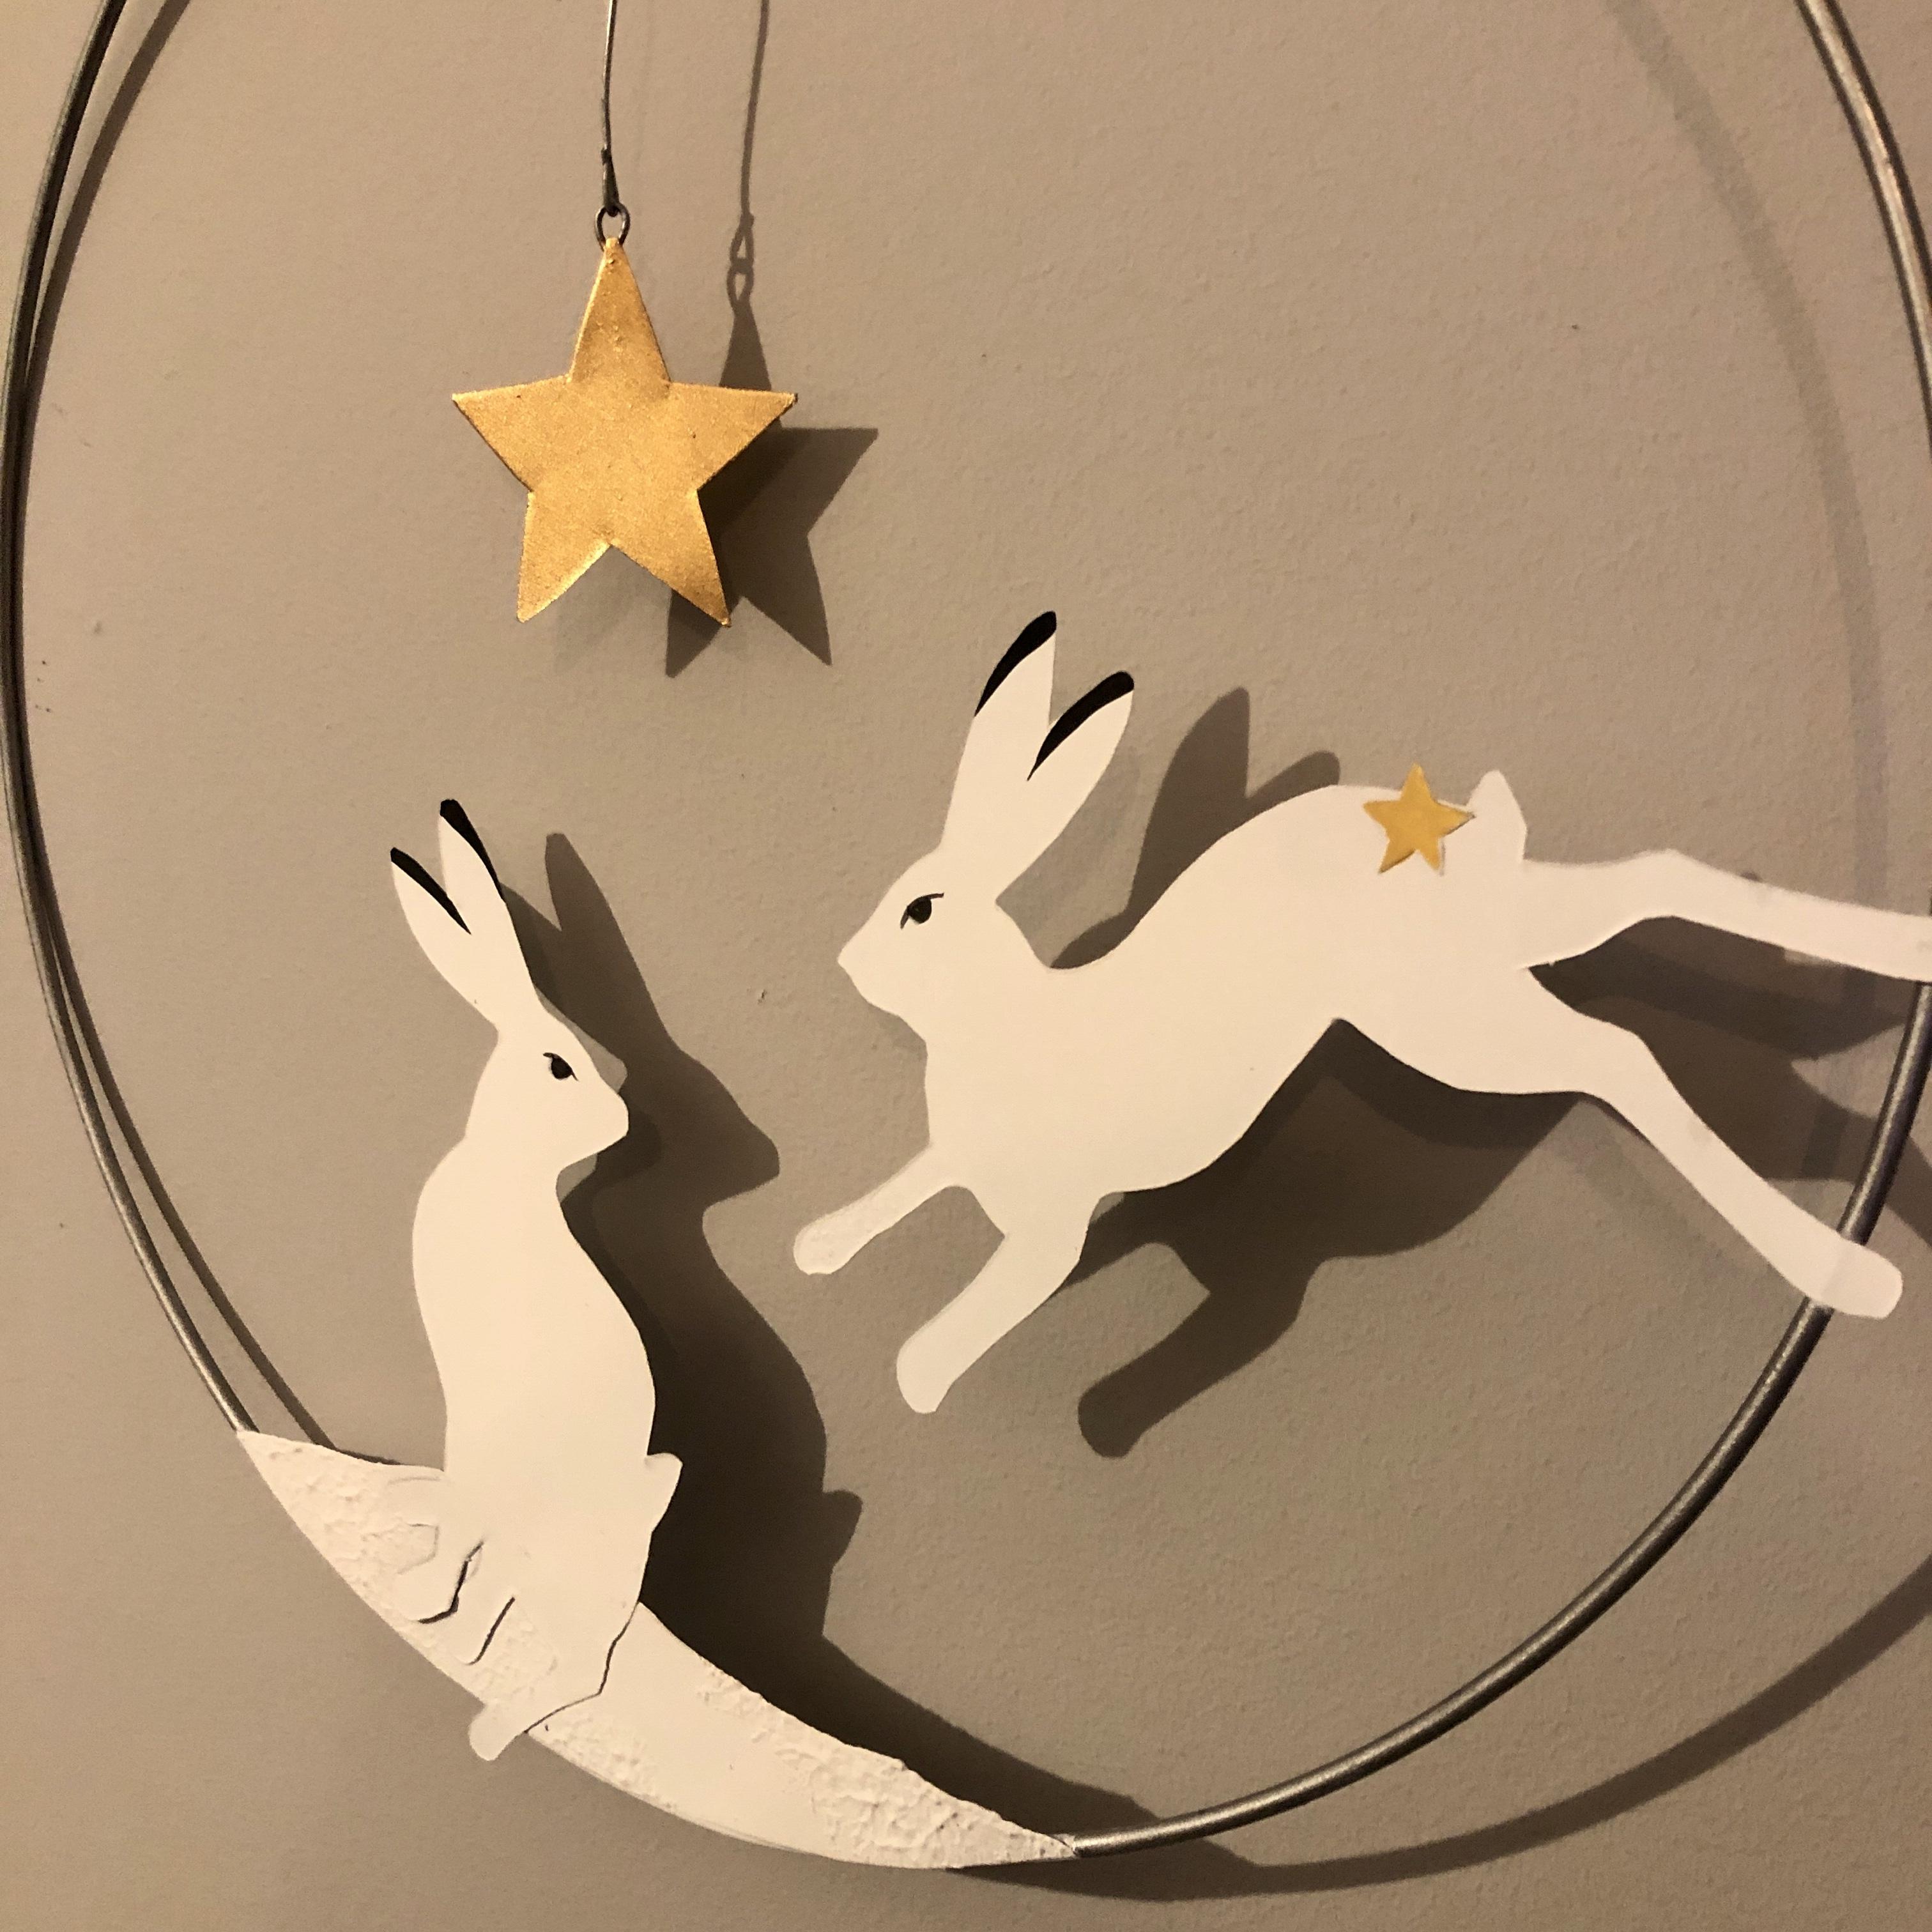 Artic hare hanging Christmas wreath by shoeless joe